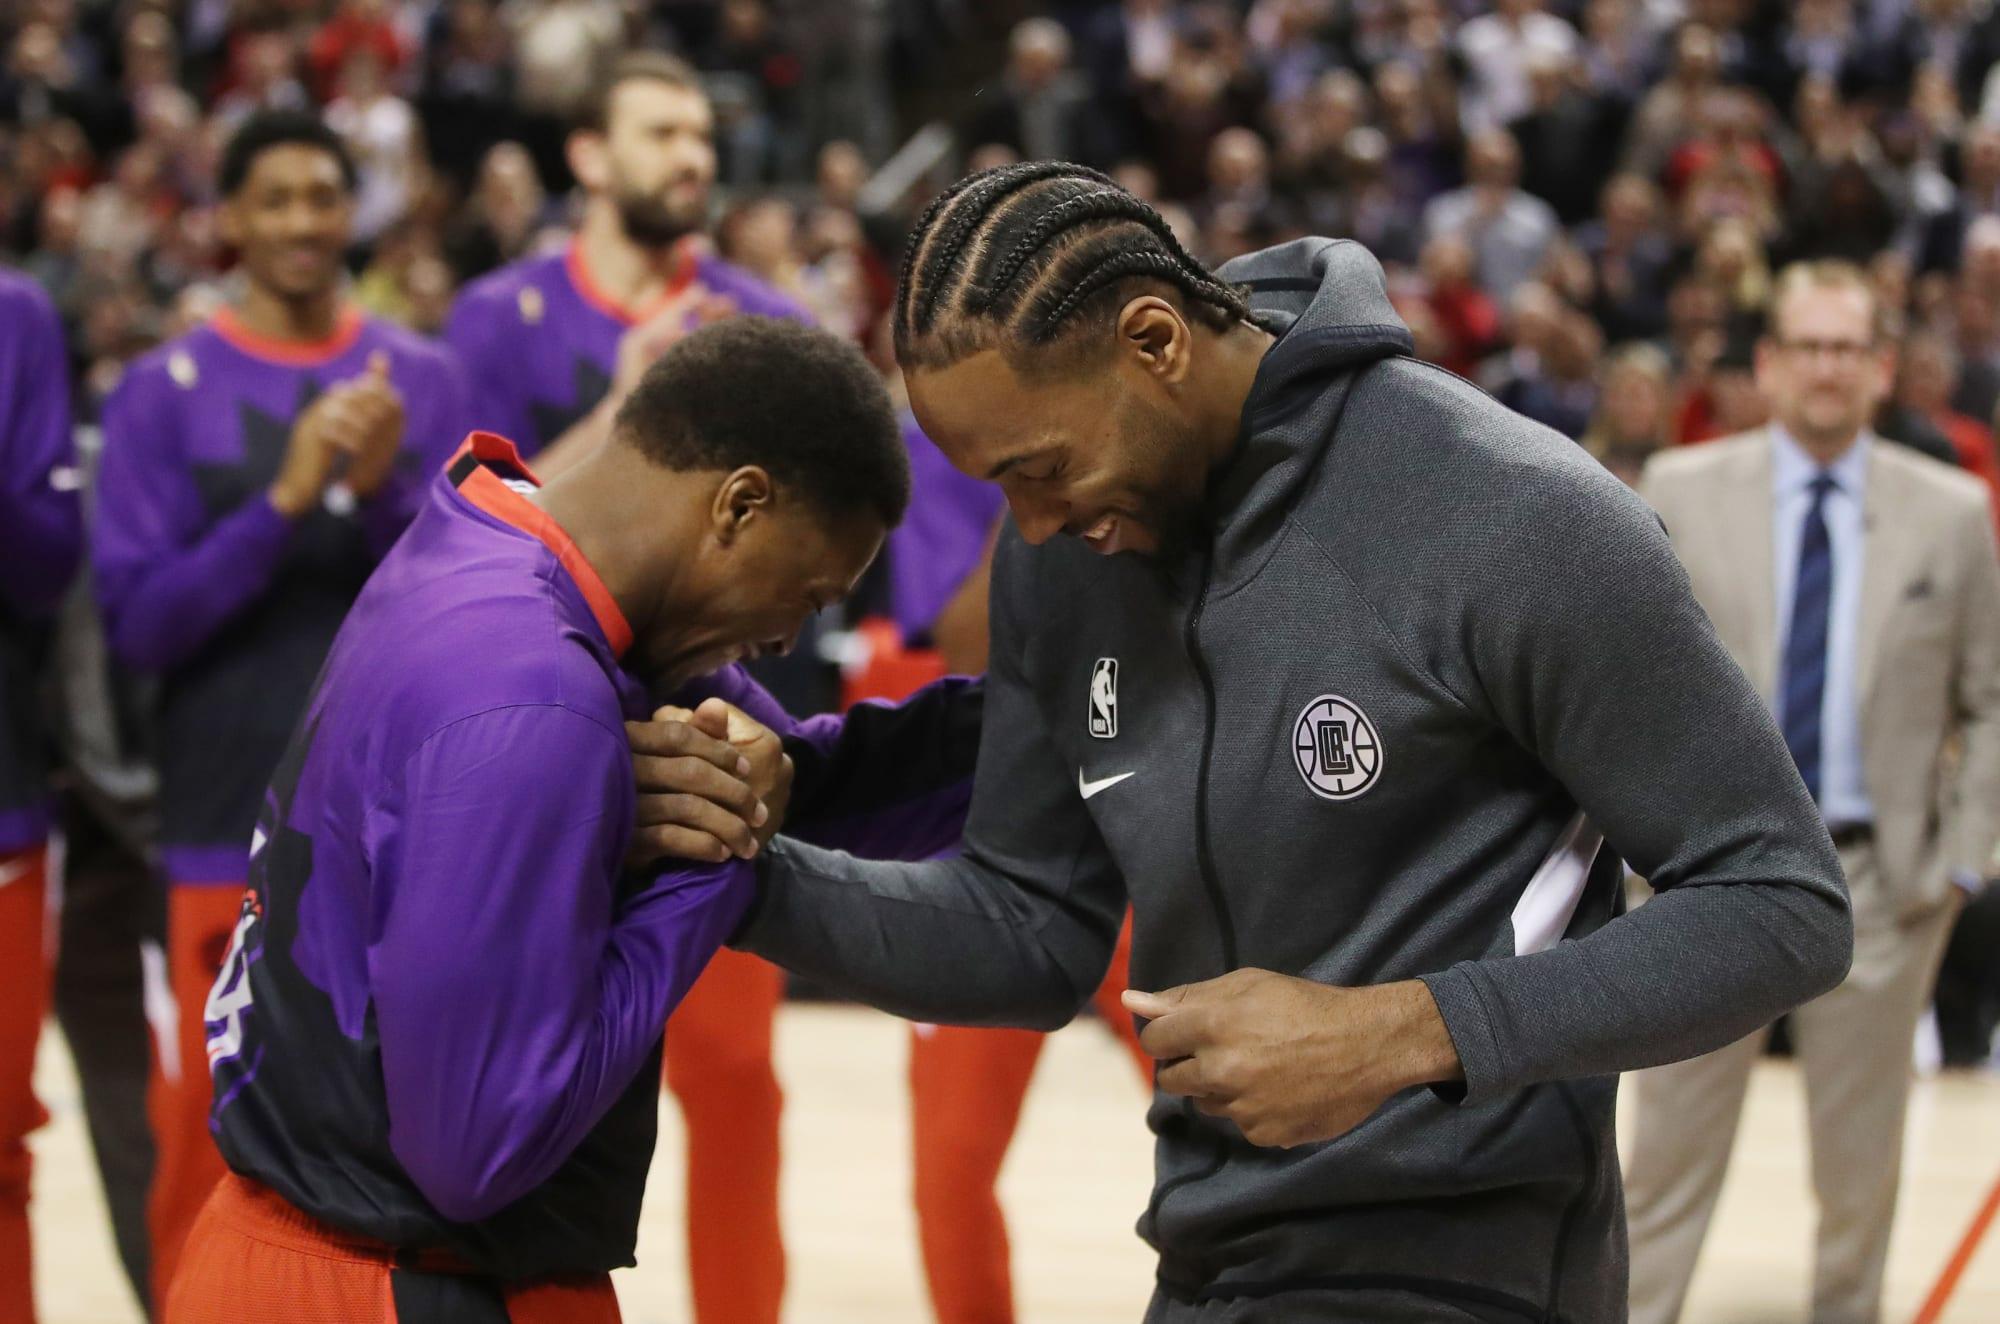 Toronto Raptors: Kawhi Leonard leaving Toronto was a huge mistake